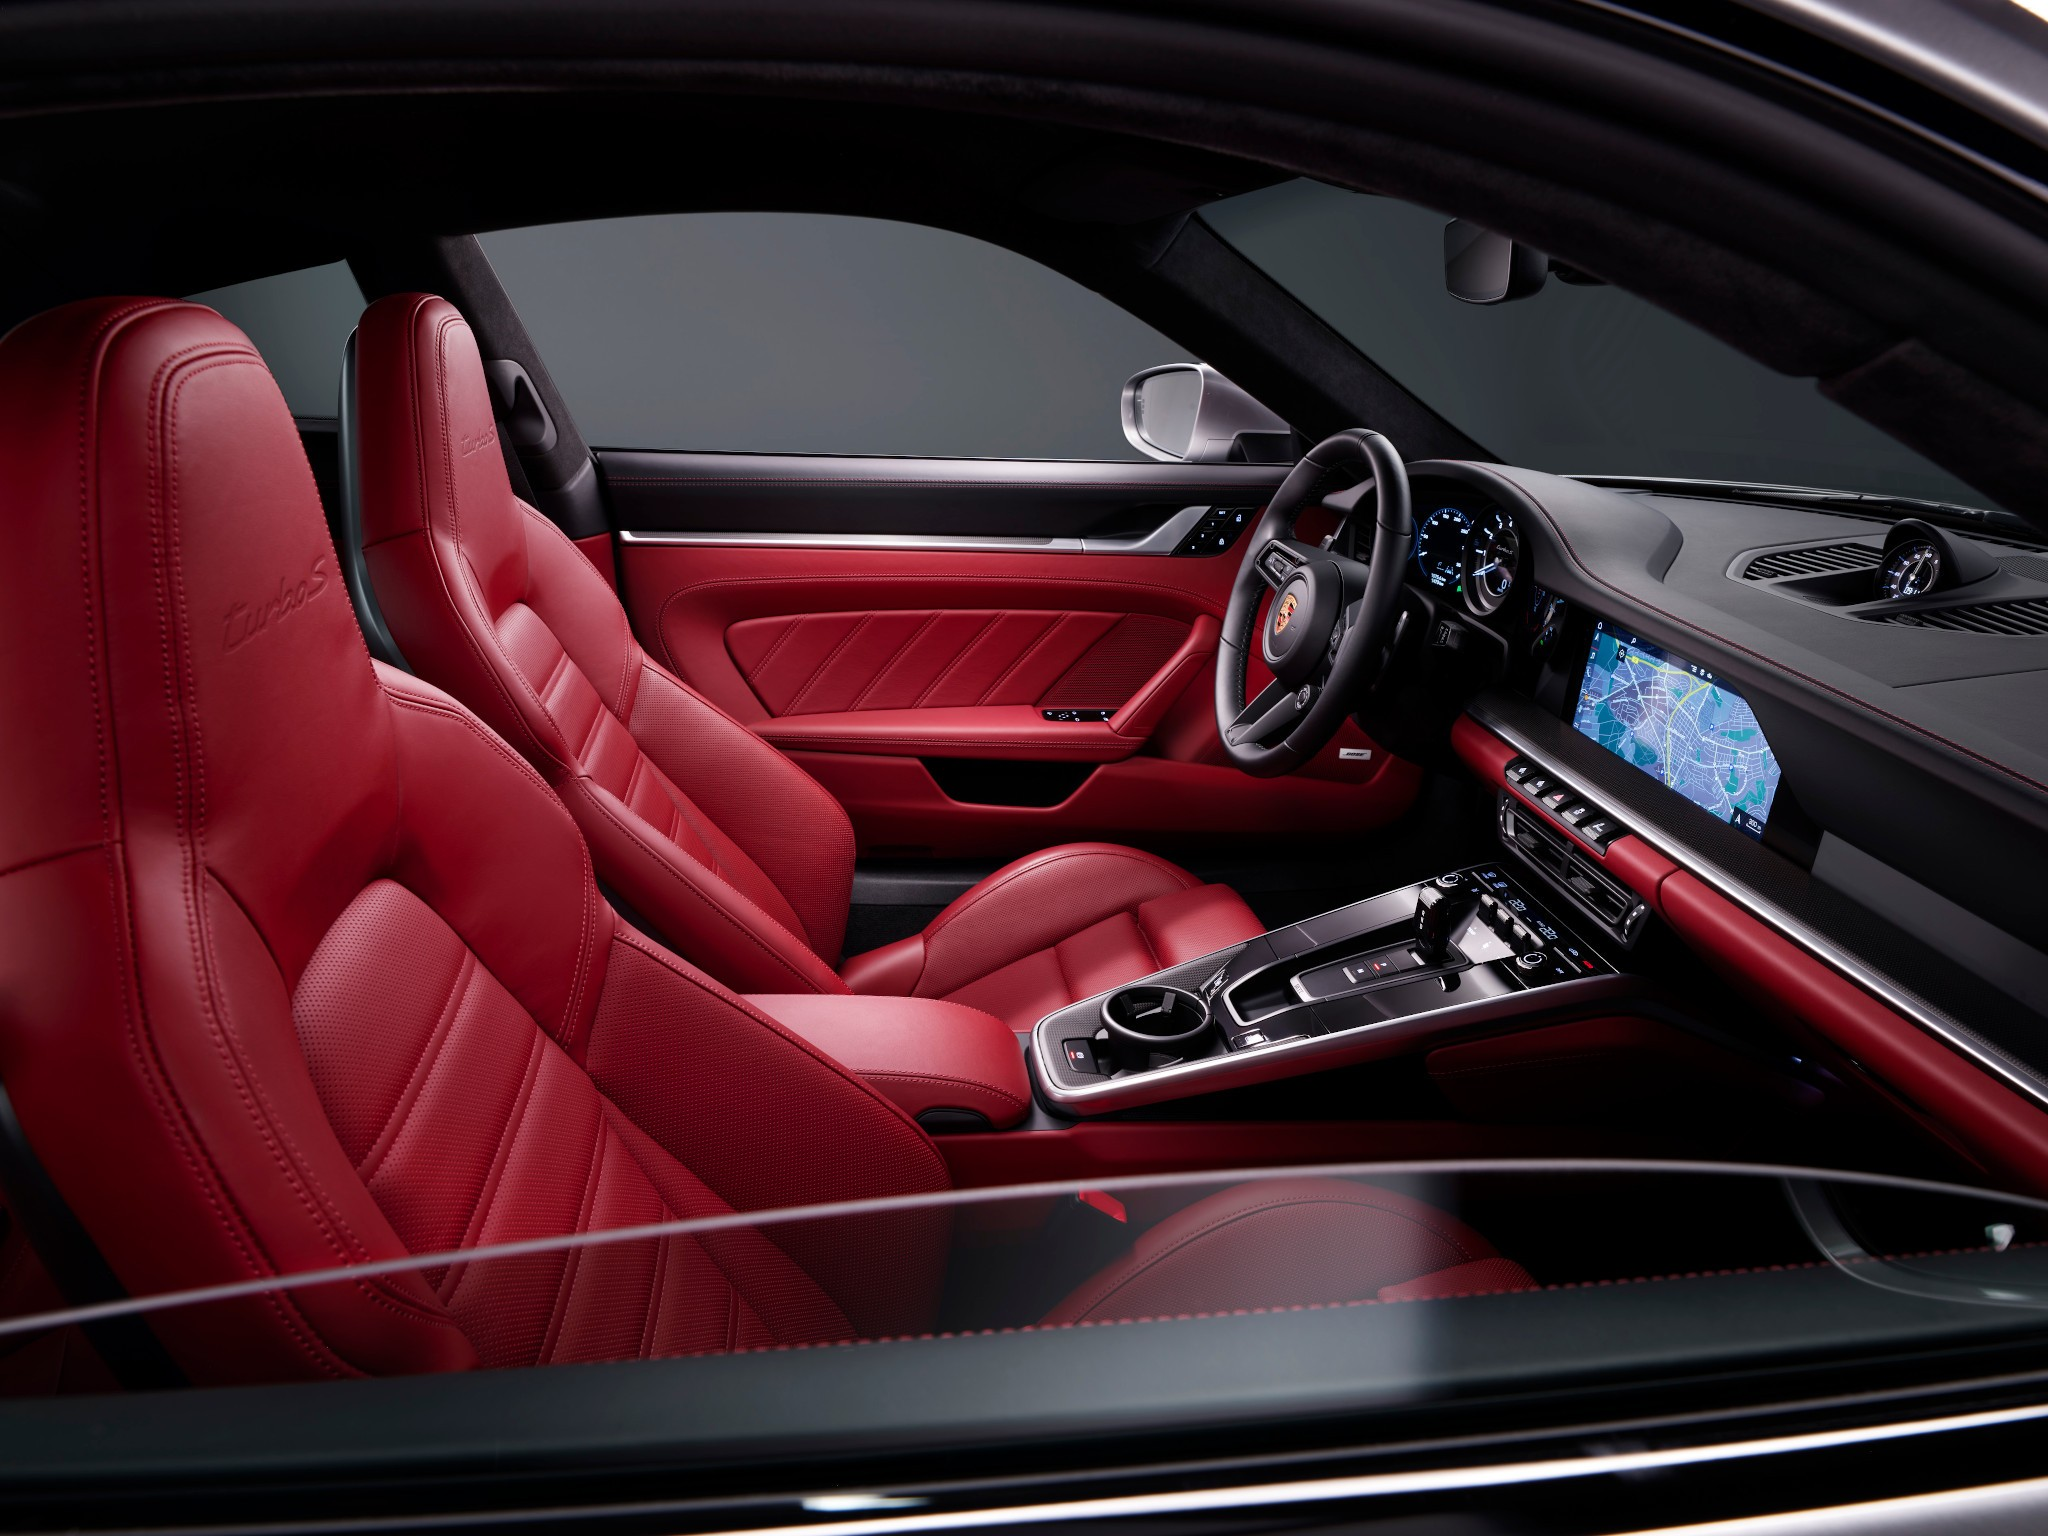 porsche-911-turbo-s-2021-1-front-row--interior--red.jpg